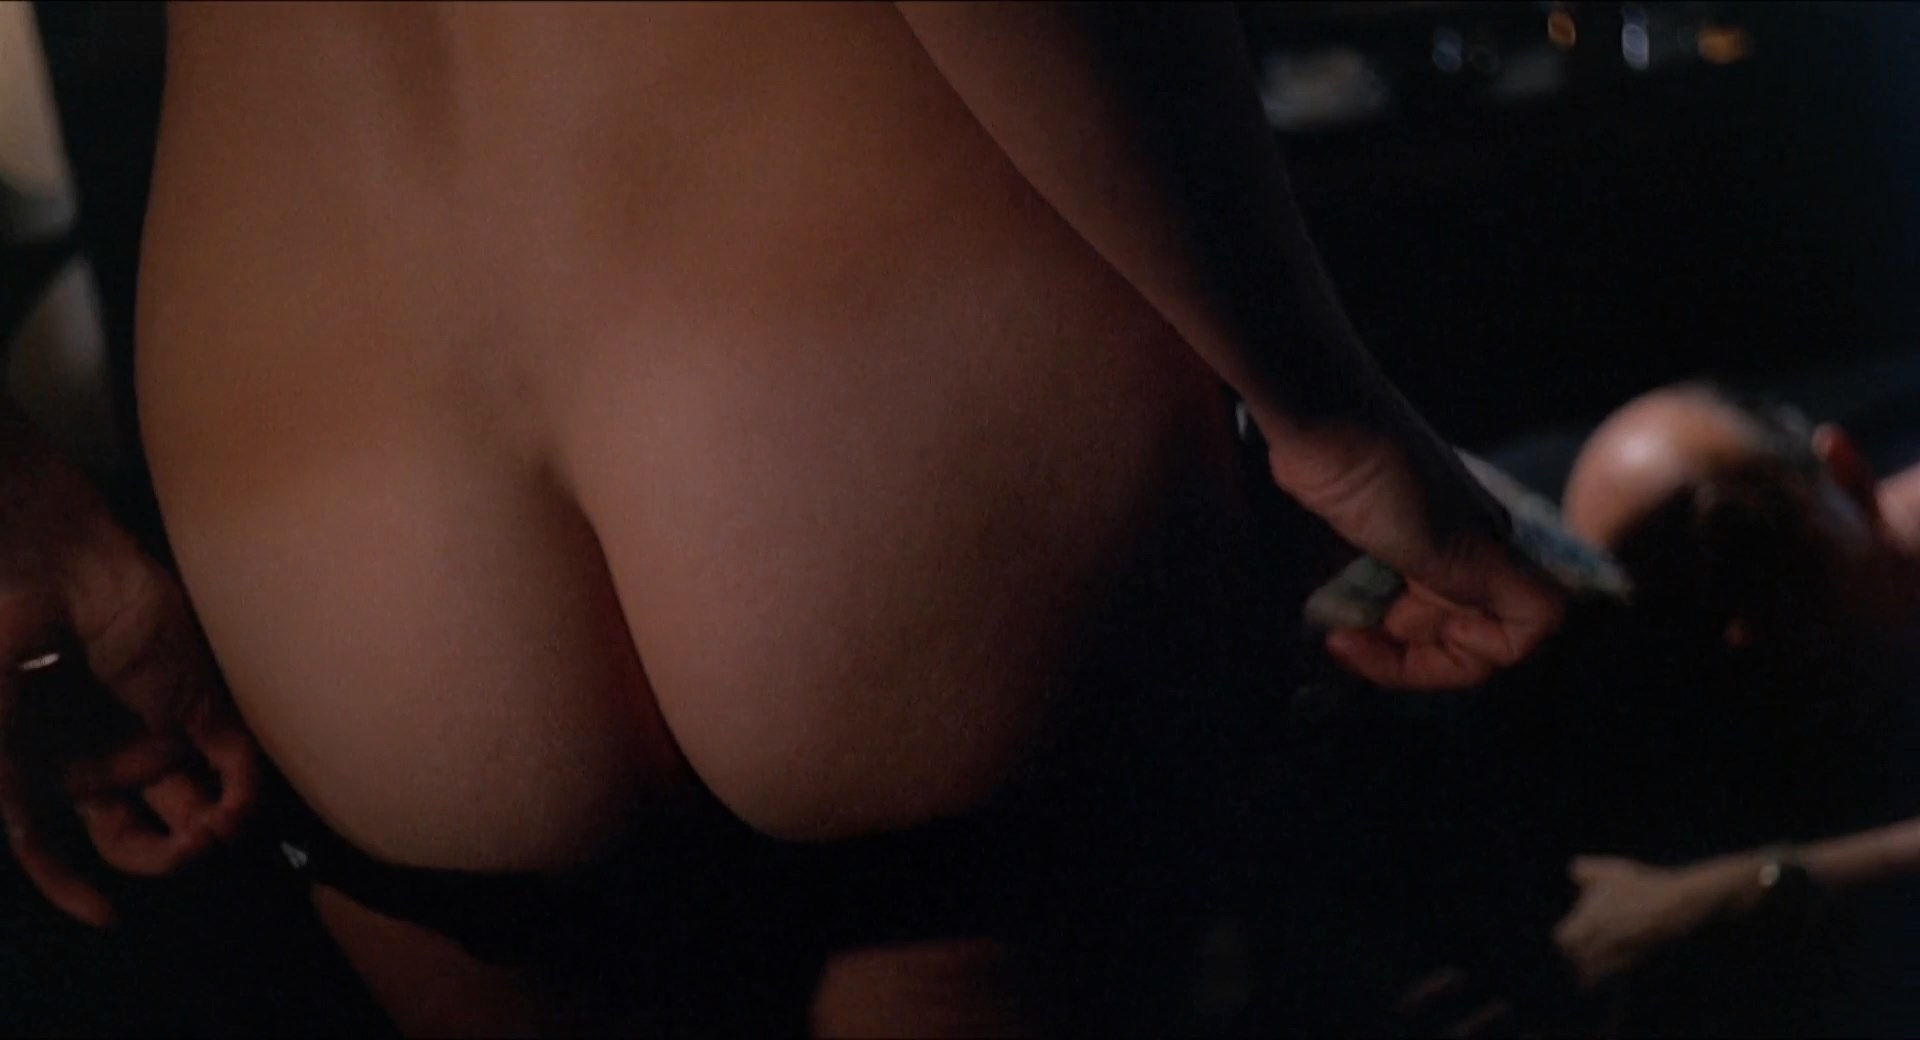 Rachel starr hot pussy